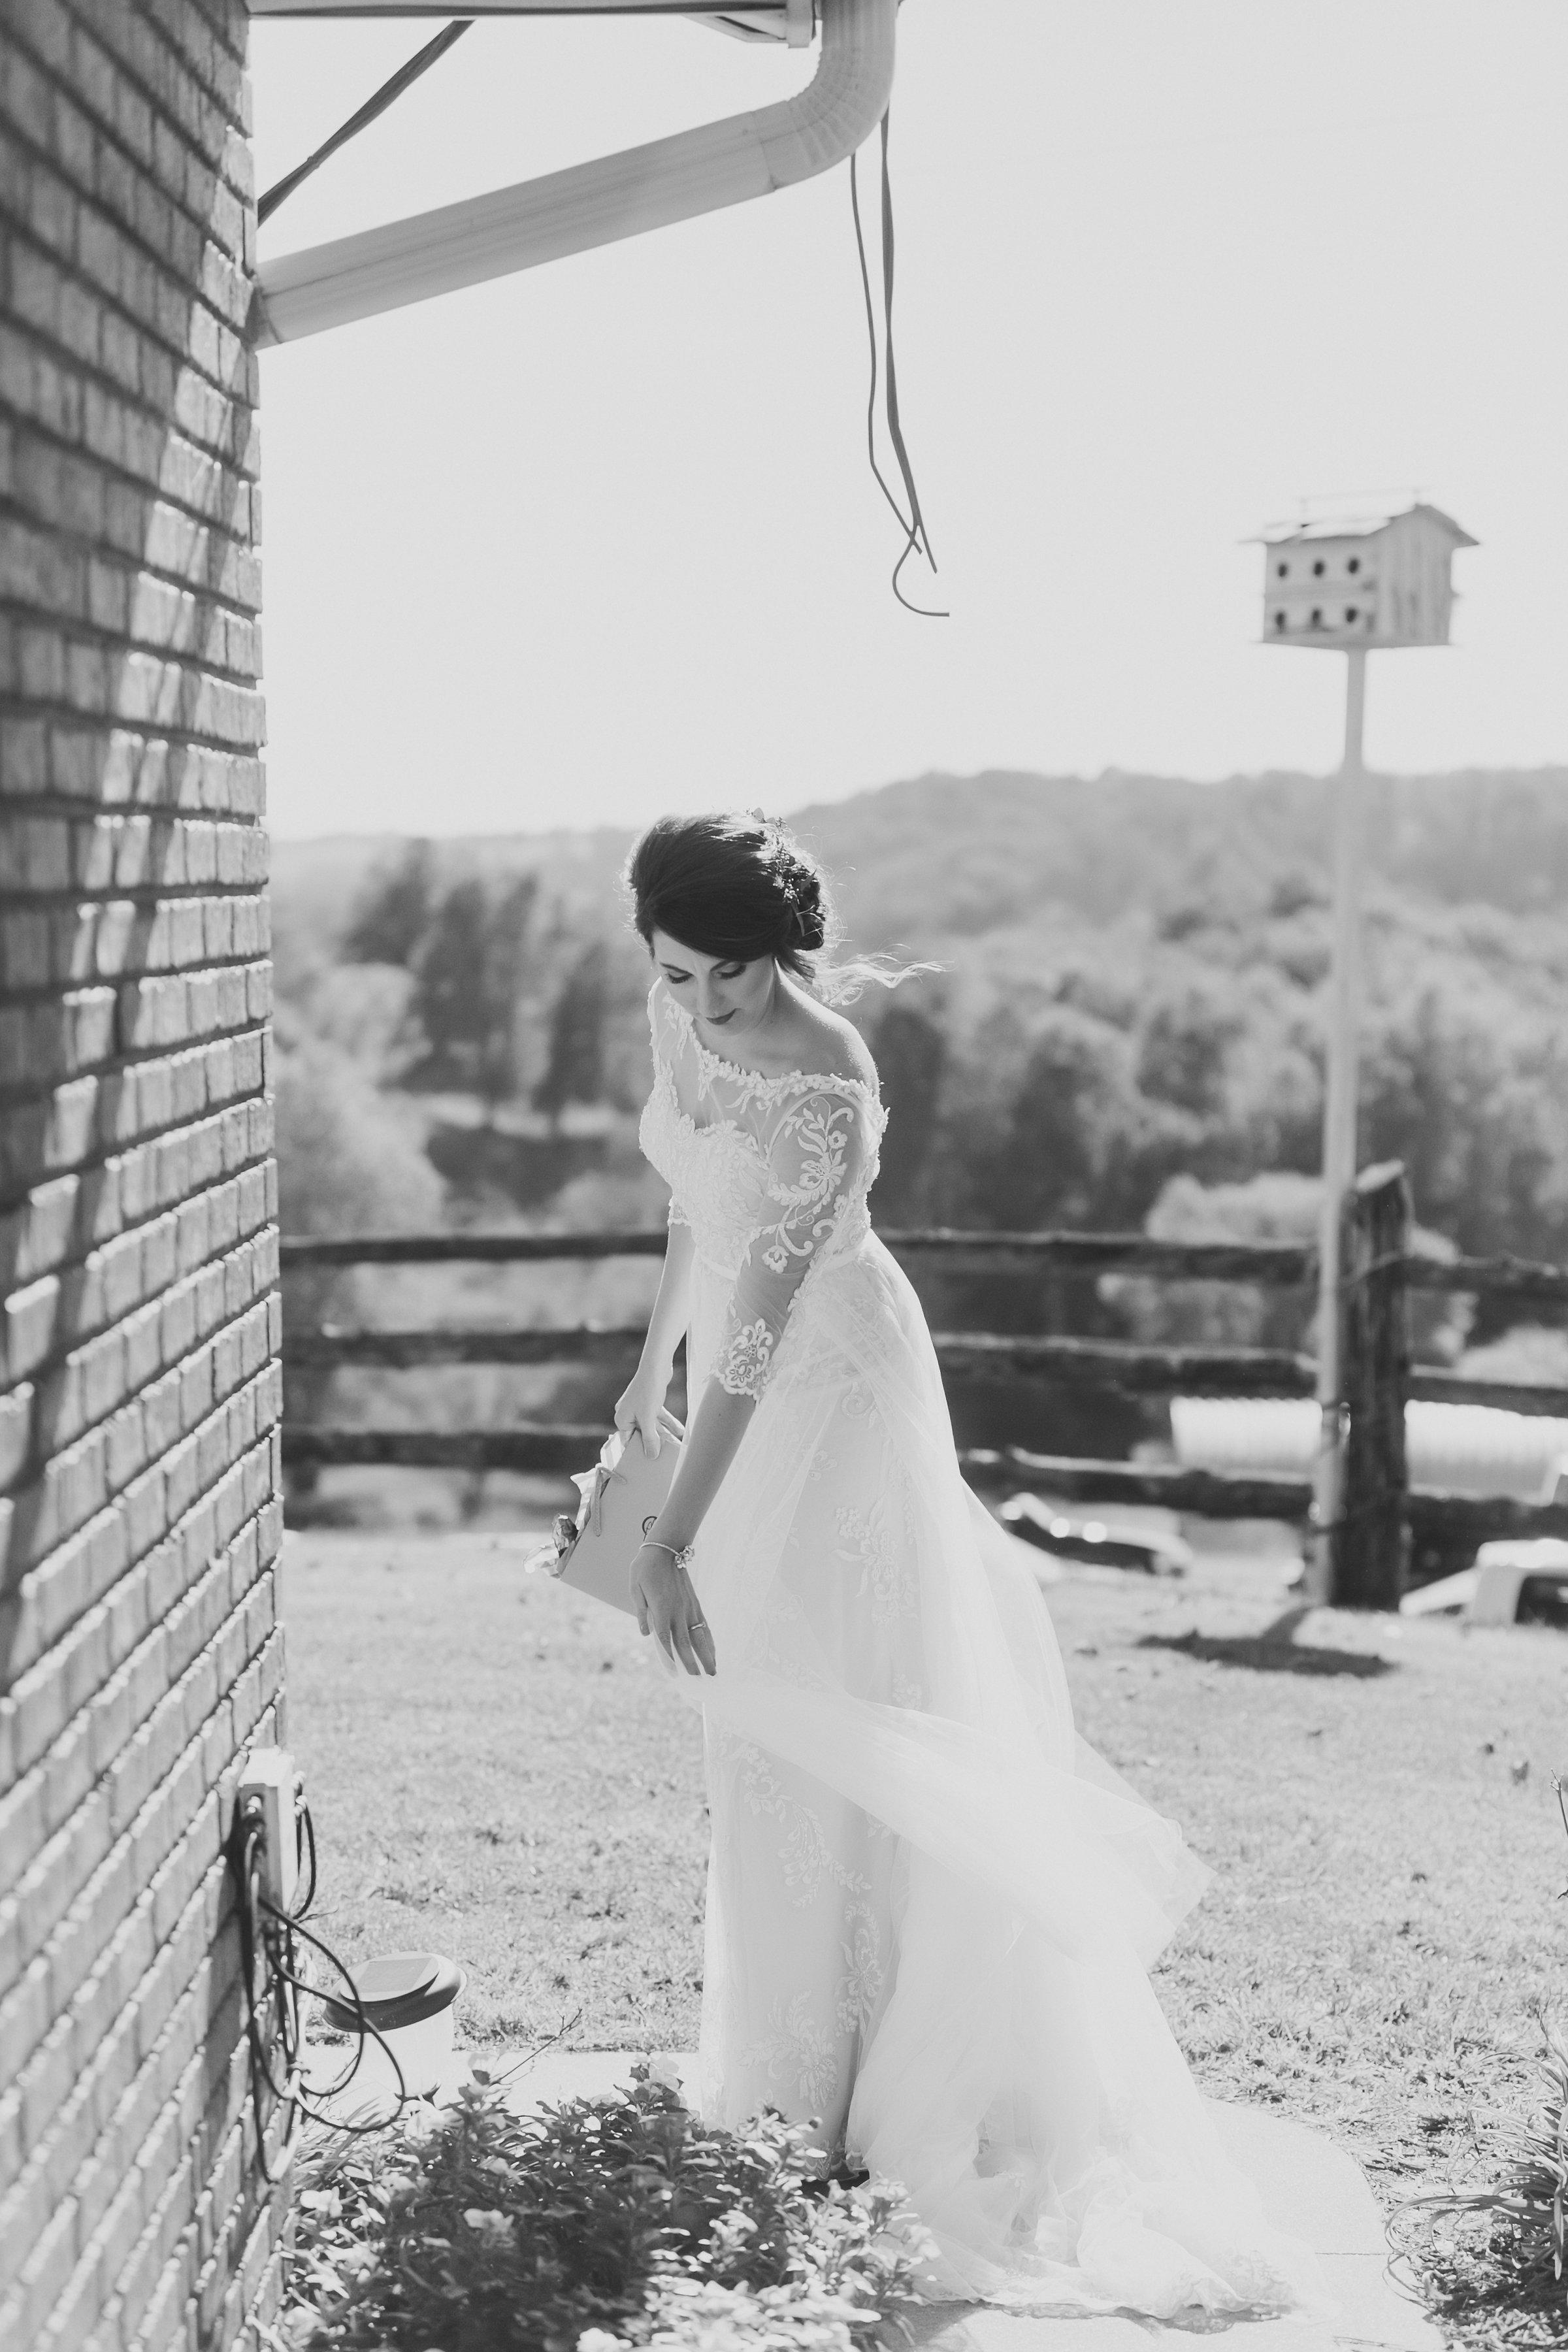 MissouriRusticWedding_StLouisWeddingPhotographer_AliciaDan_CatherineRhodesPhotography-1165-Edit.jpg